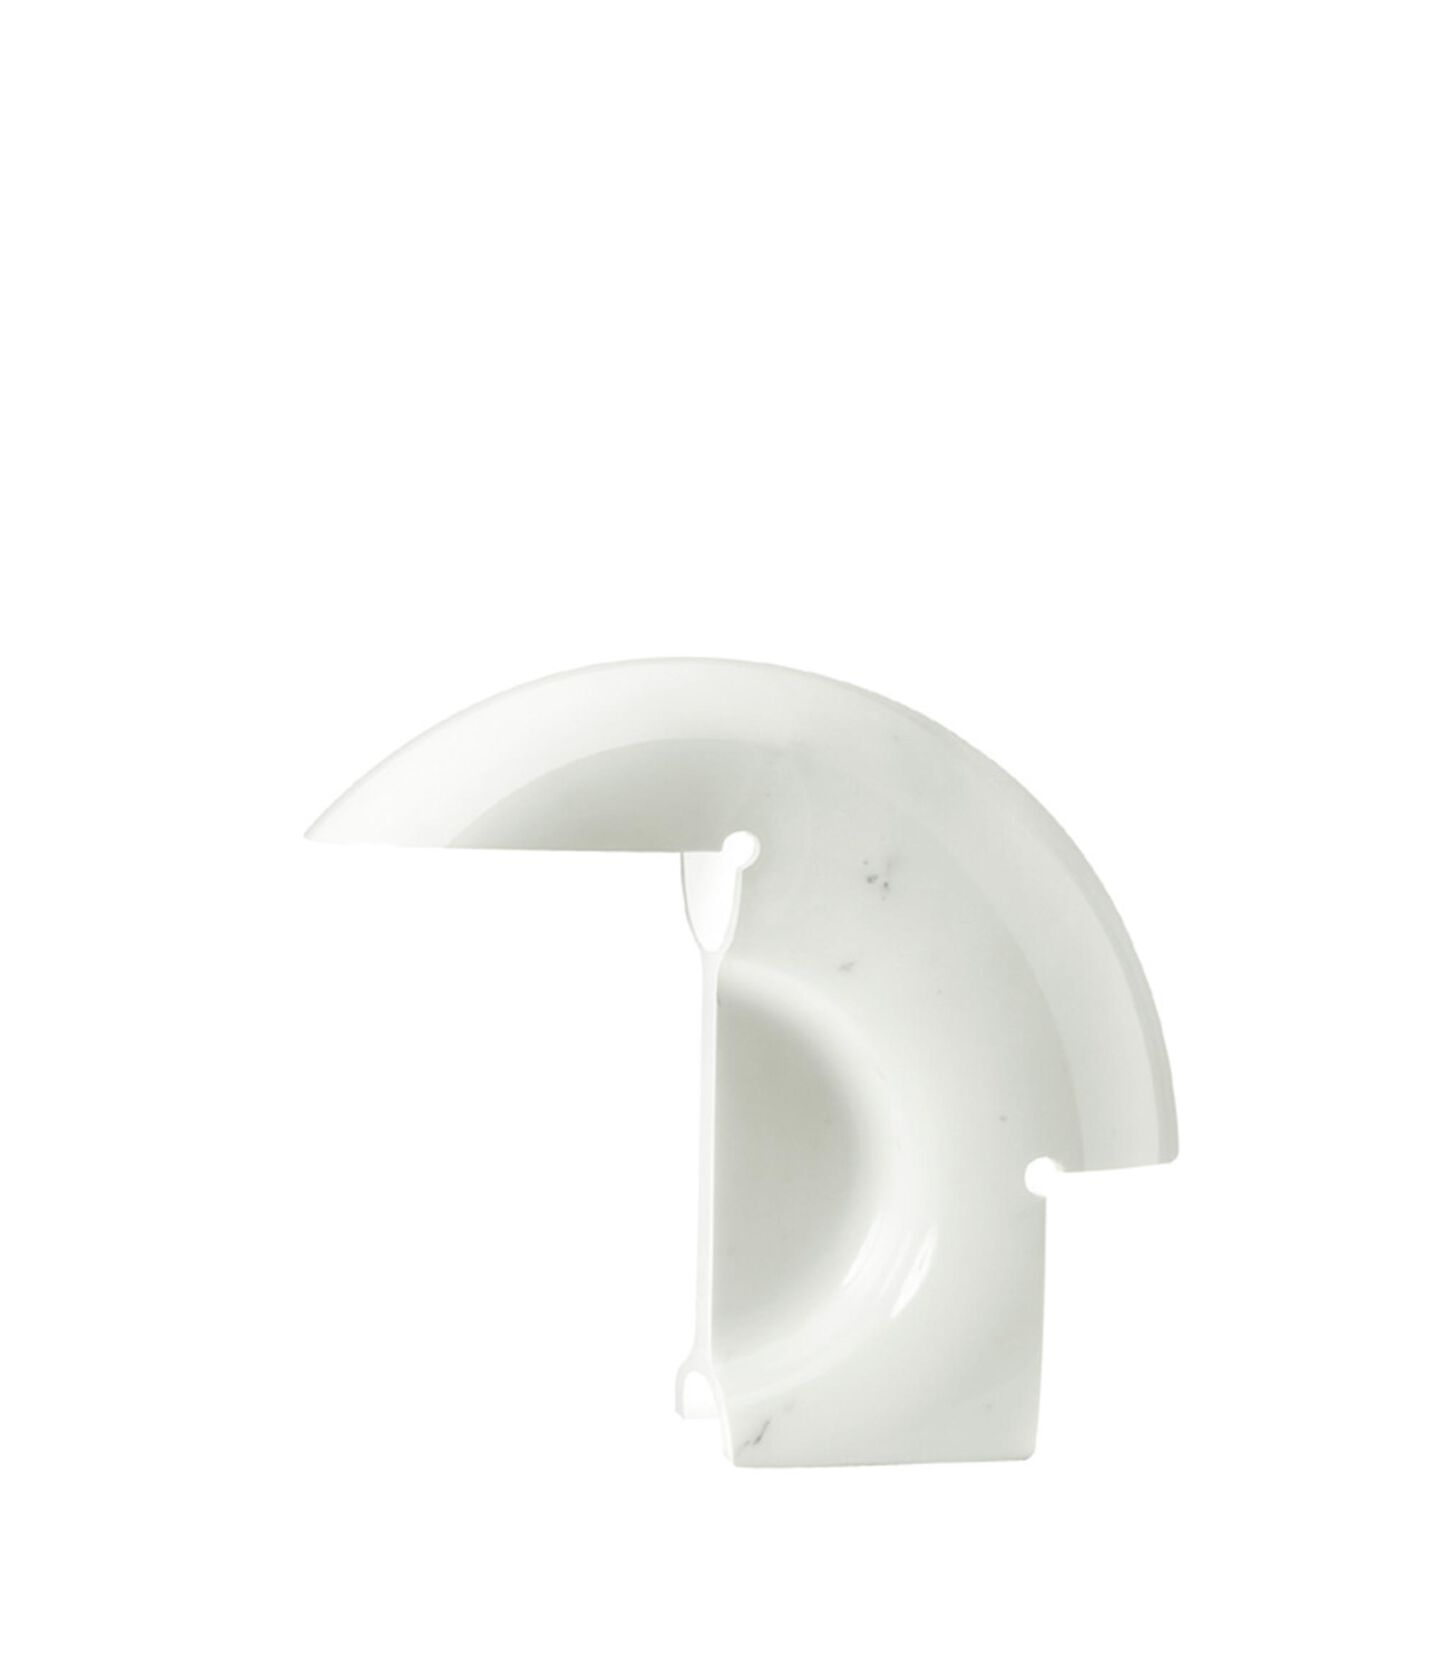 biagio-table-scarpa-flos-F070000-product-still-life-big